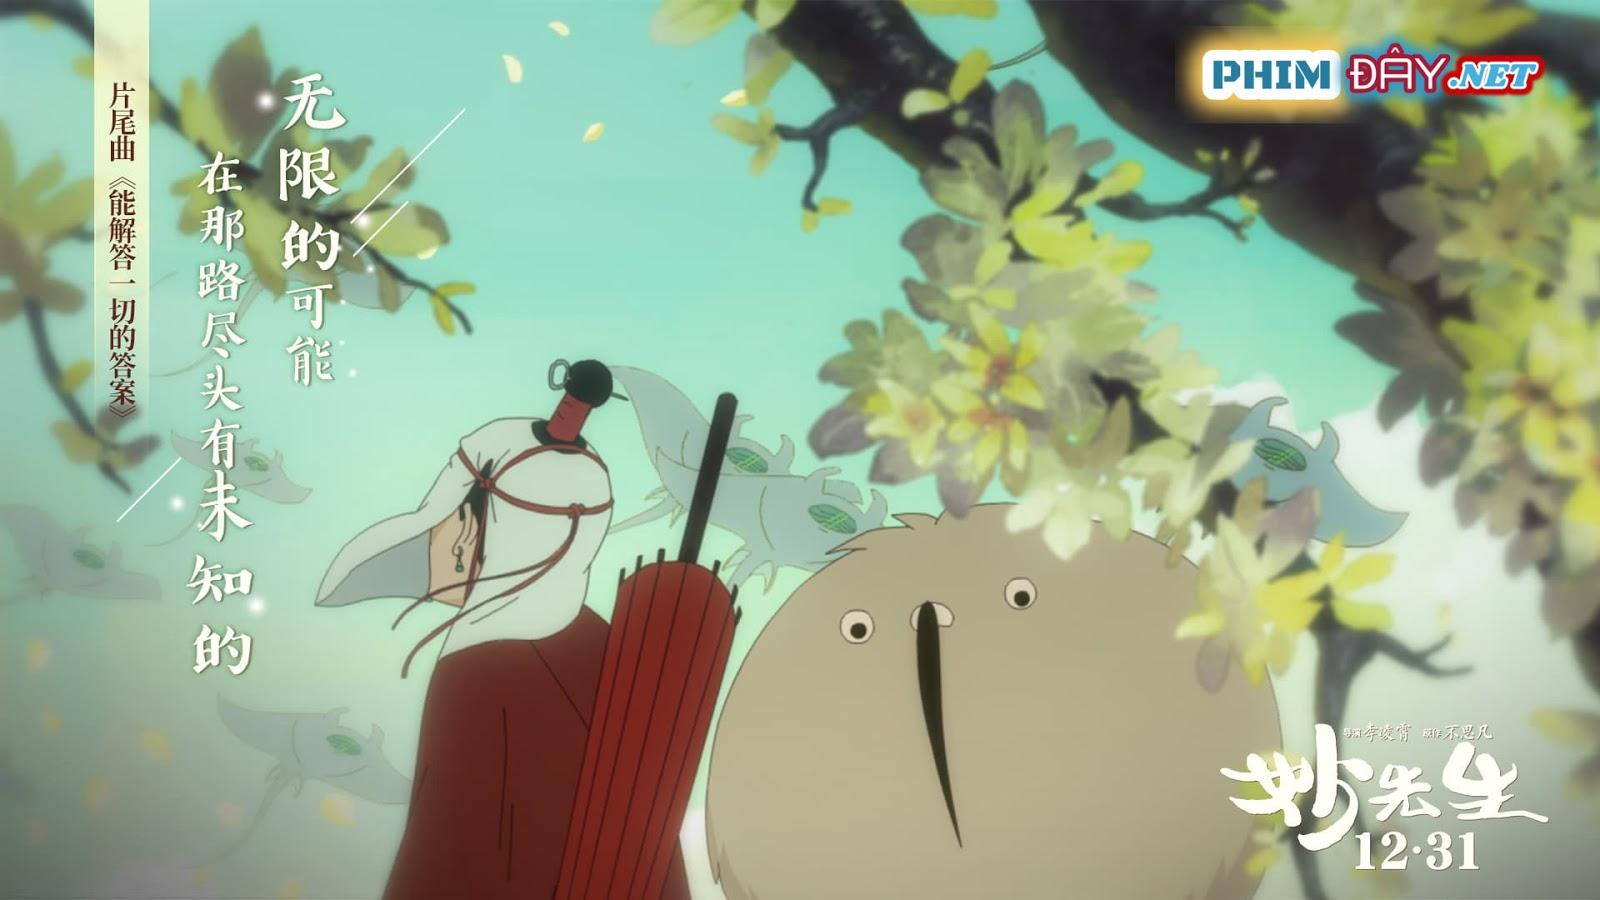 Diệu Tiên Sinh - Mr. Miao (2020)